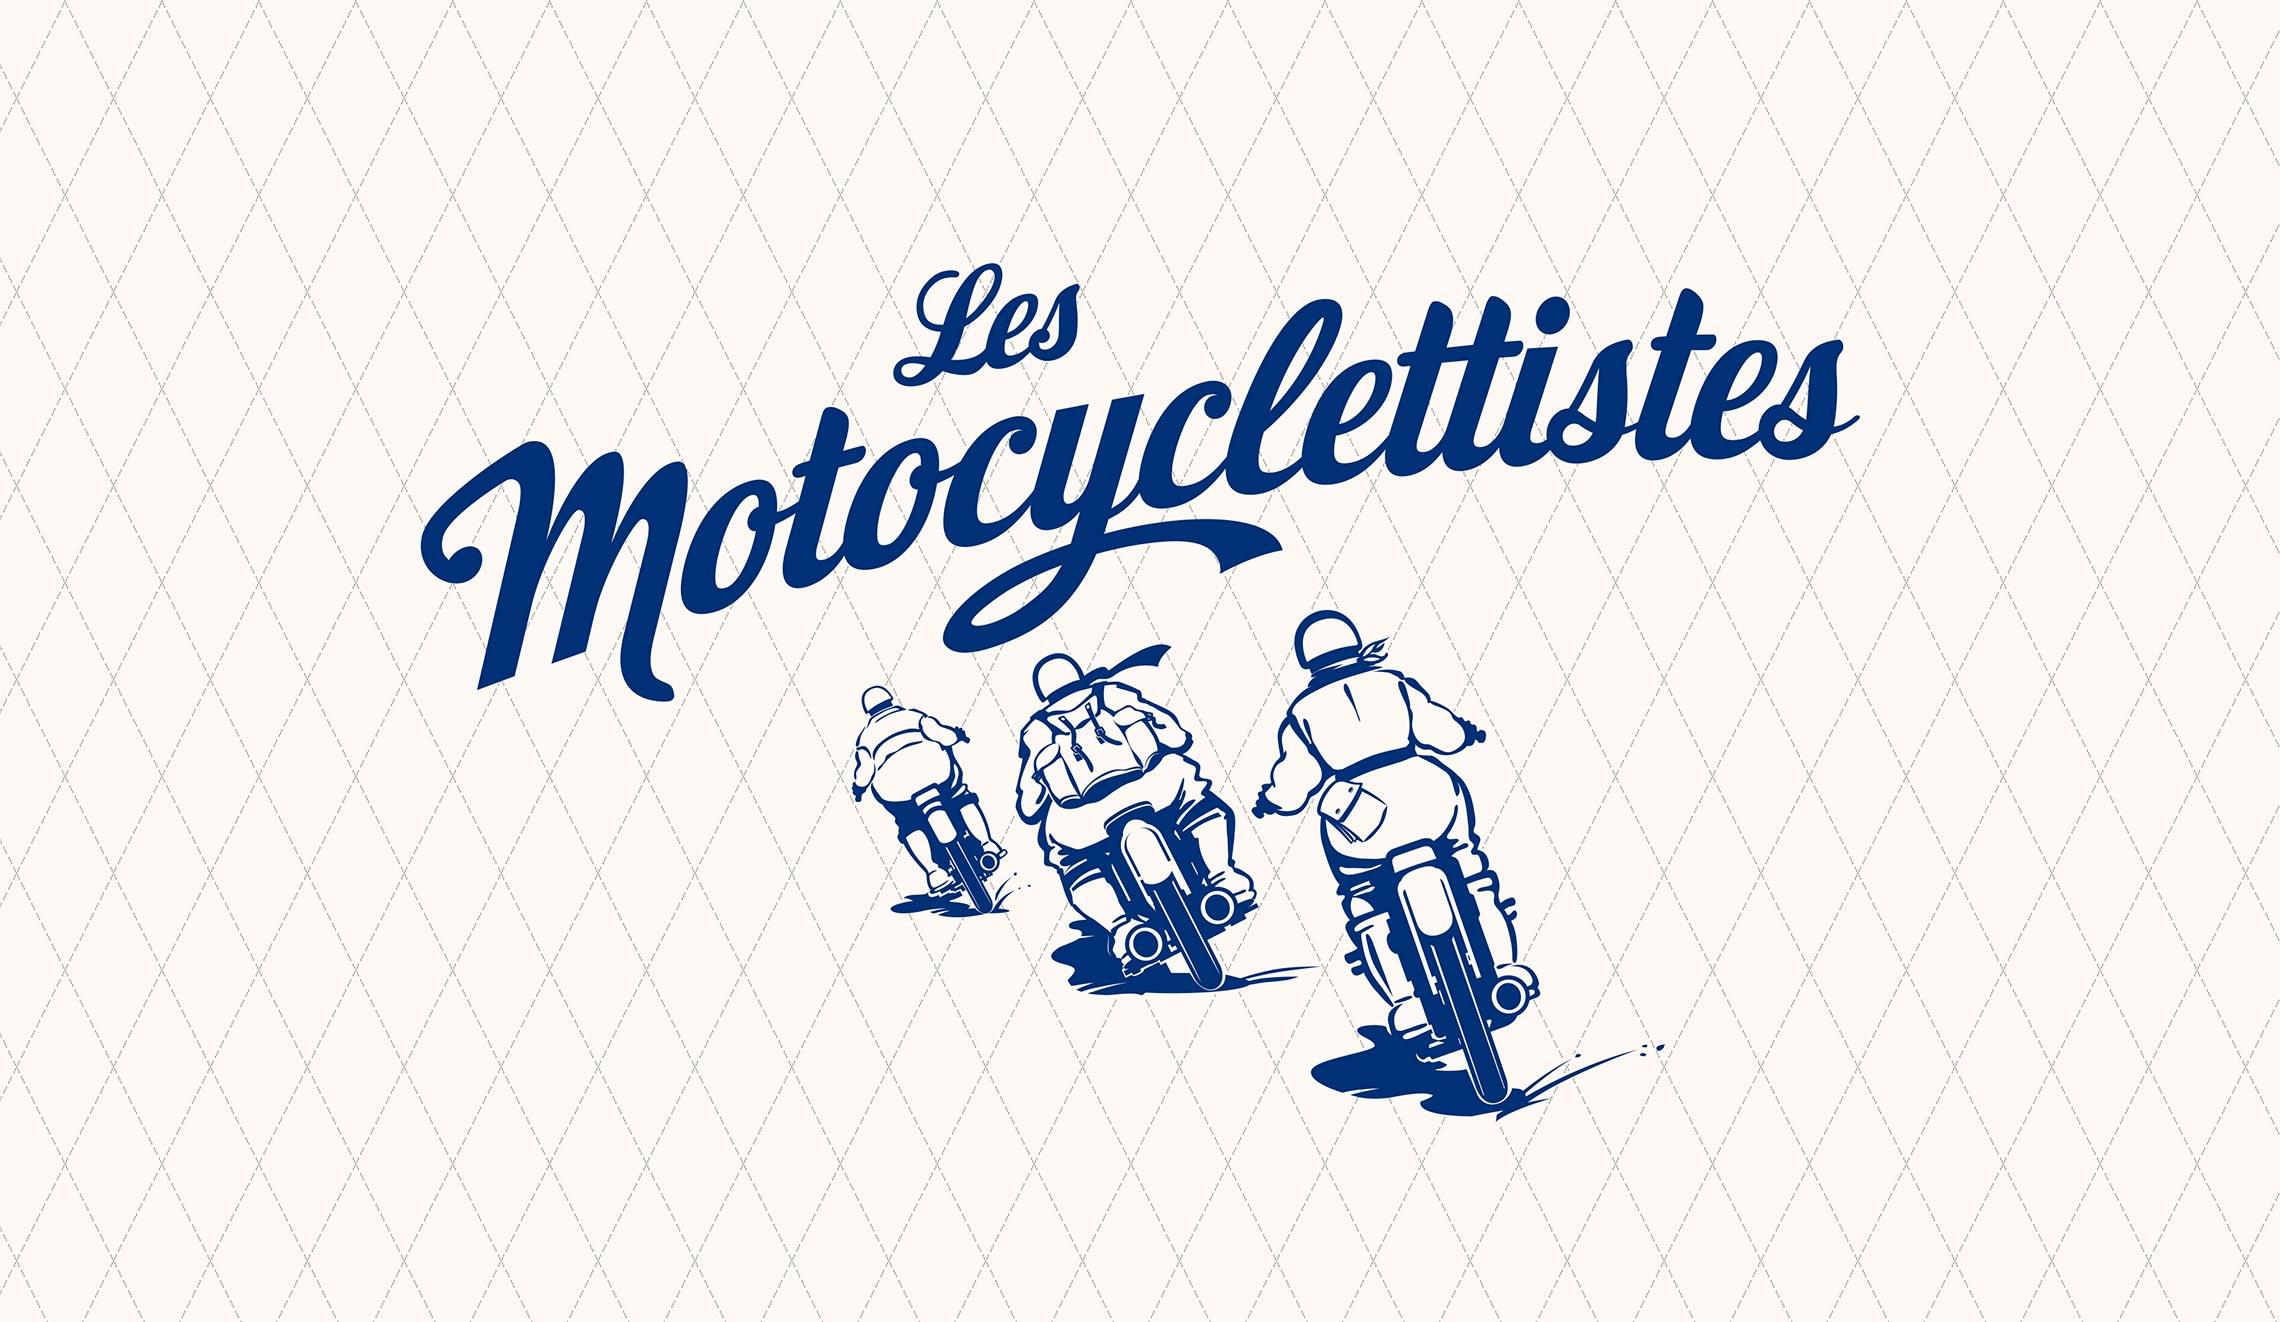 Logo Les Motocyclettistes créé par Maindor